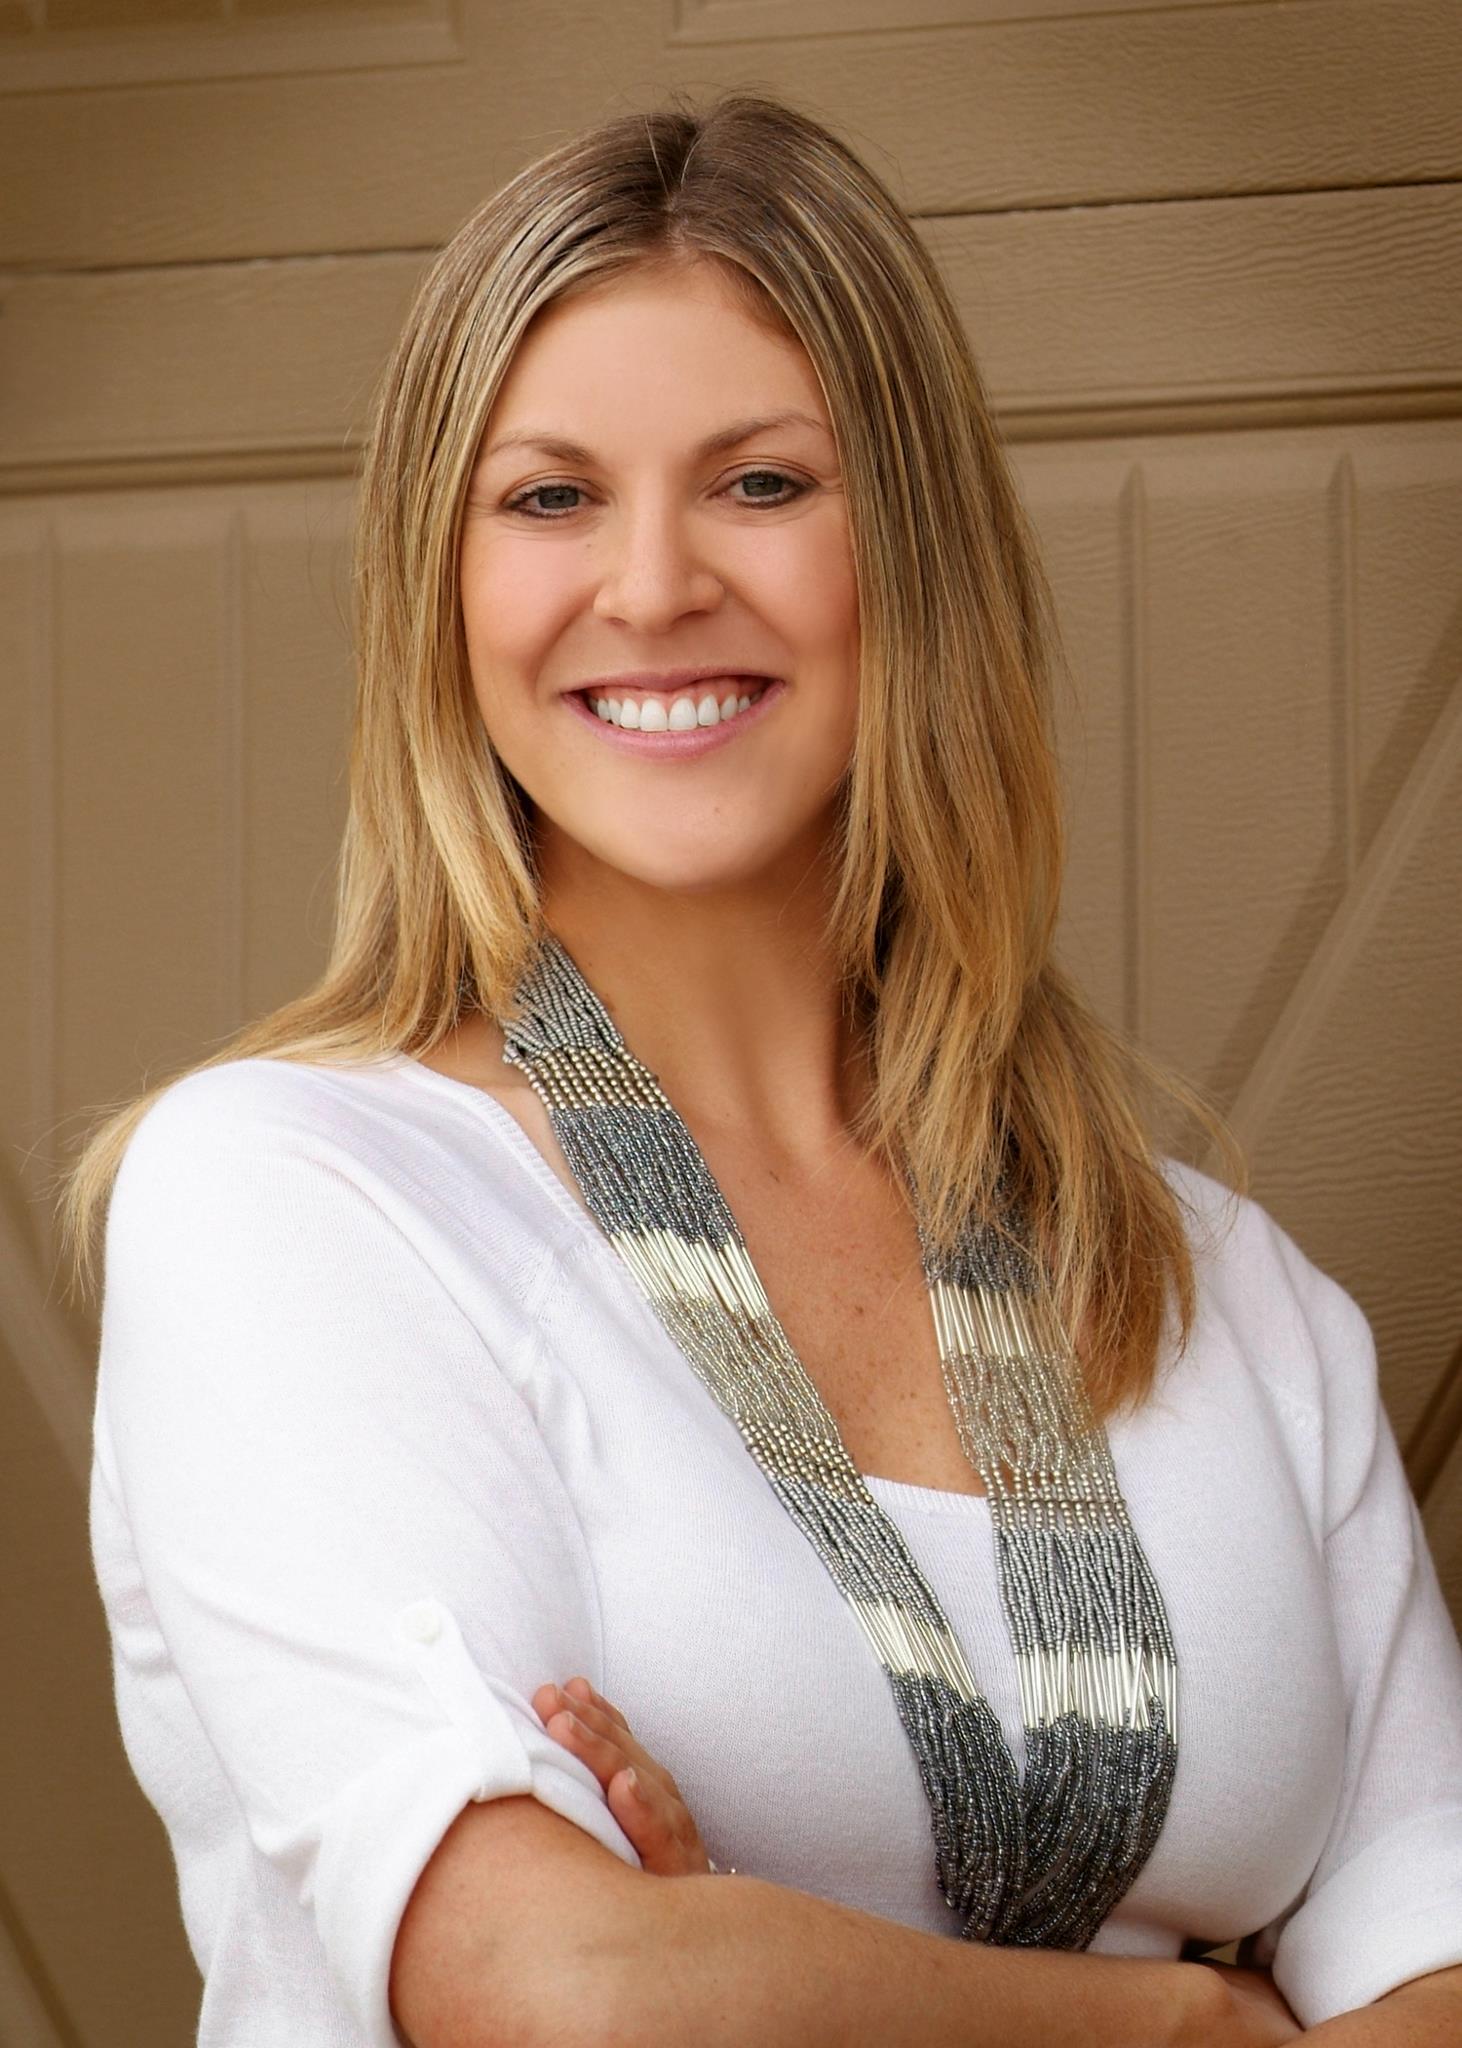 Rachel Williamson